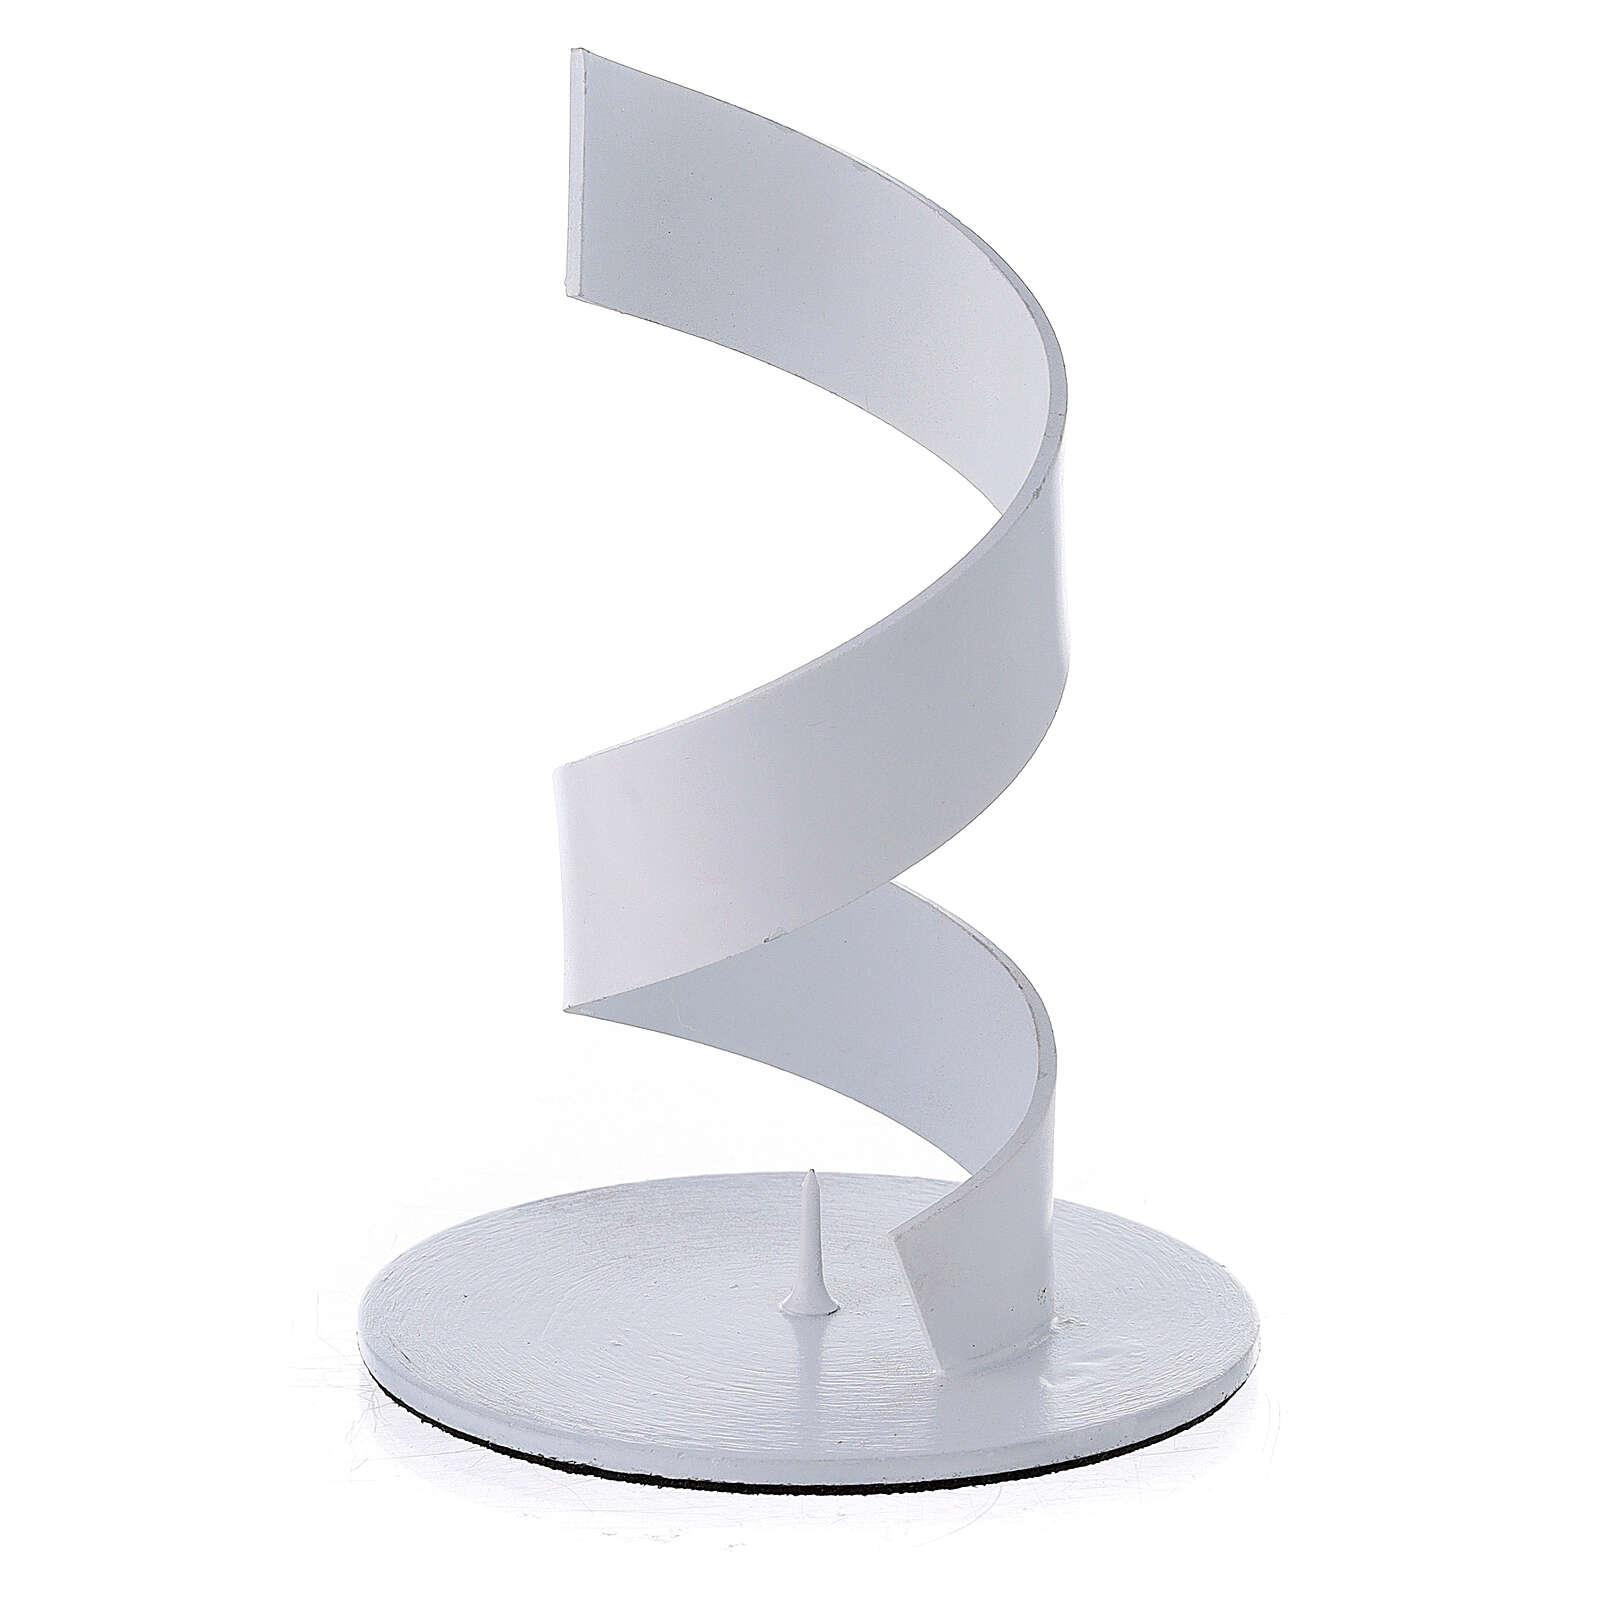 Portavela espiral aluminio blanco 4 cm 3